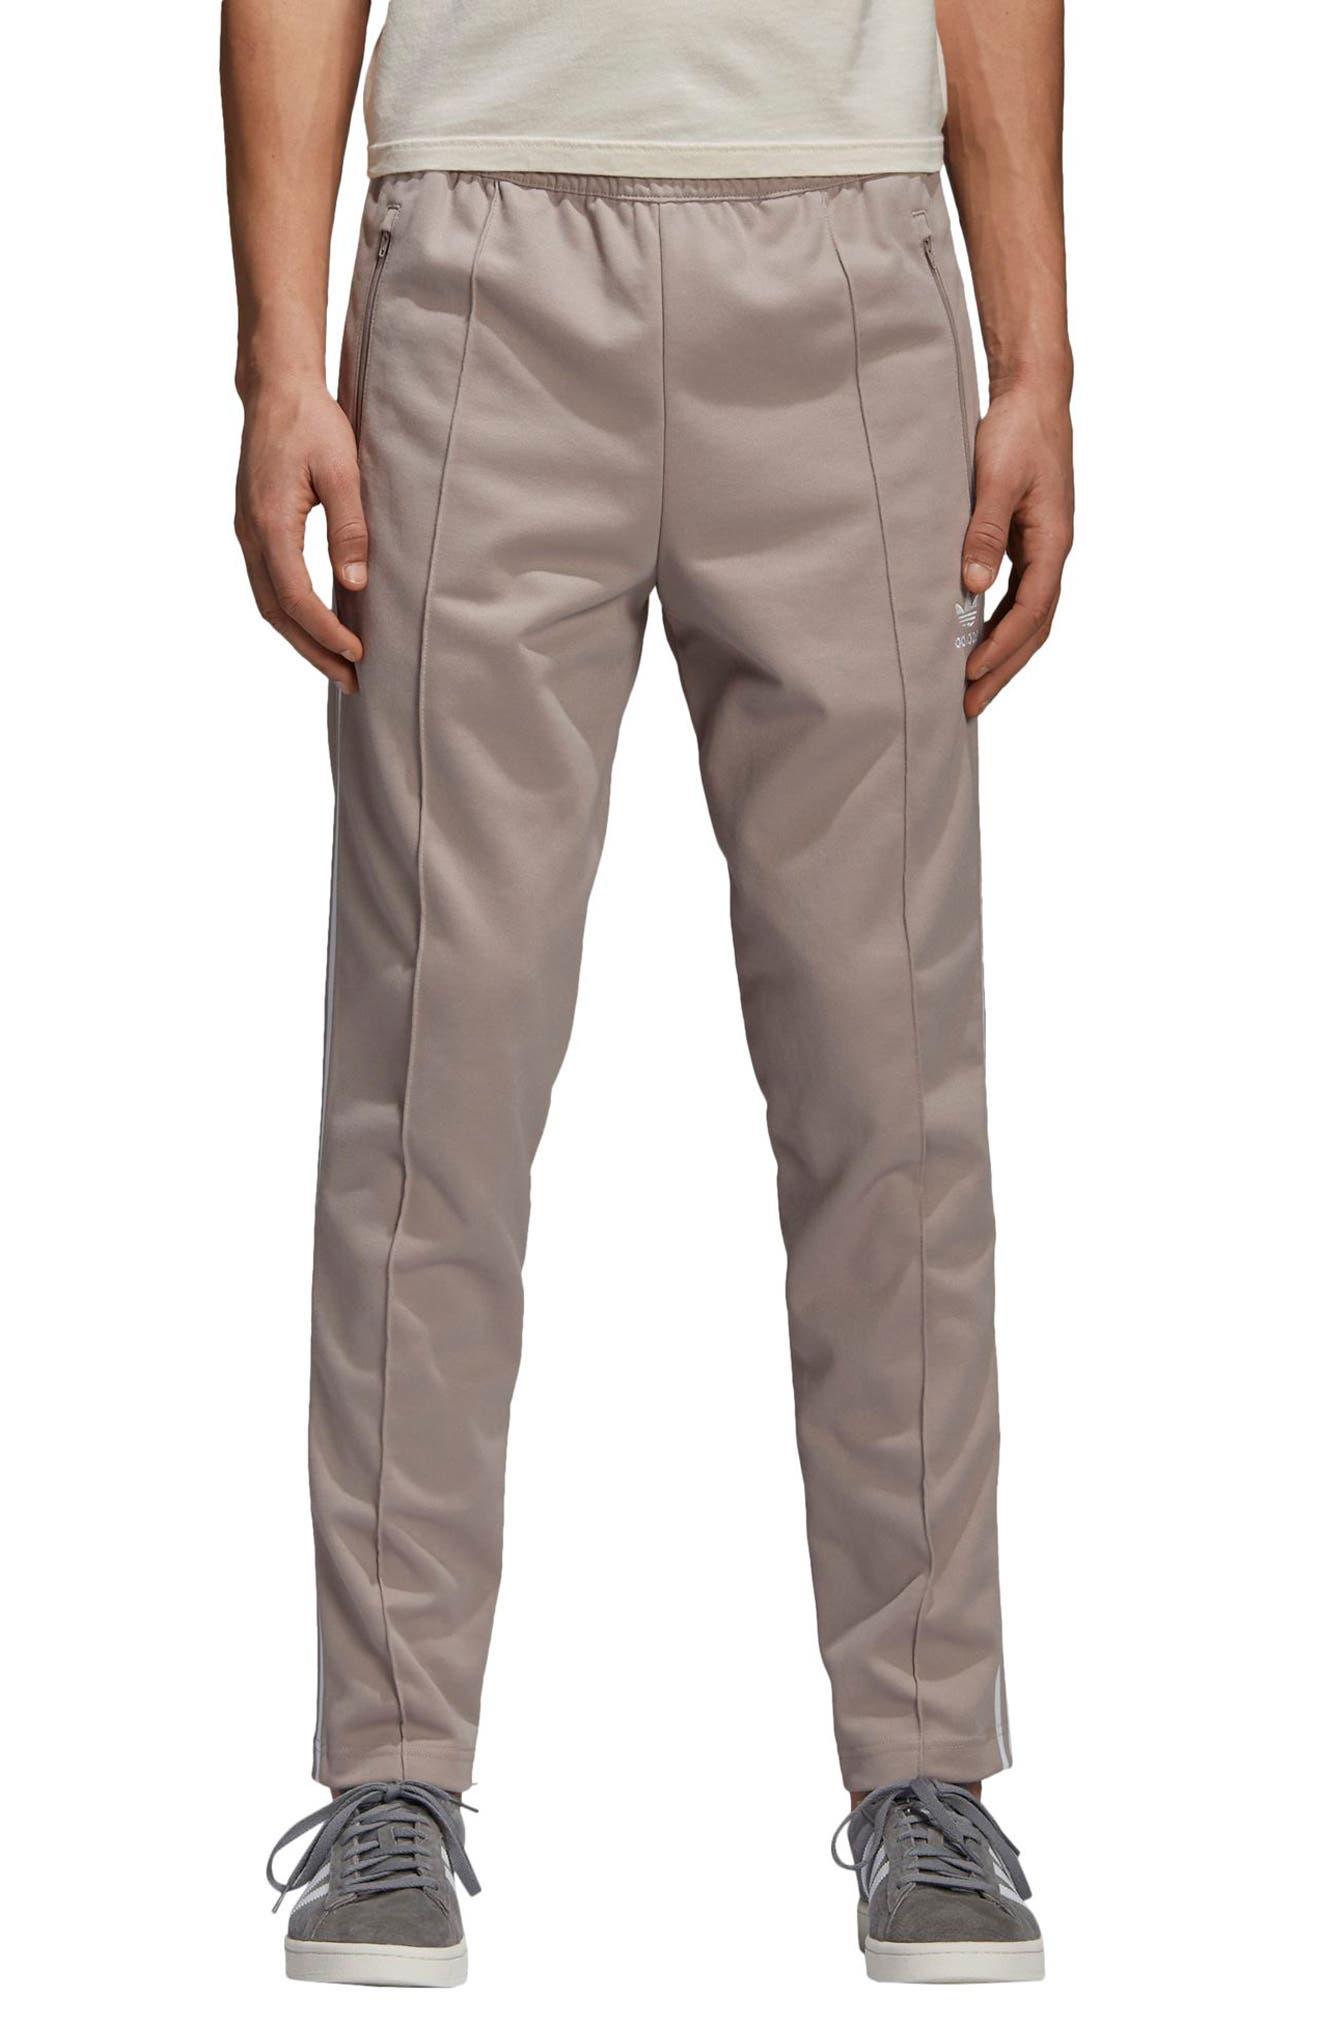 adidas Originals Beckenbauer Track Pants